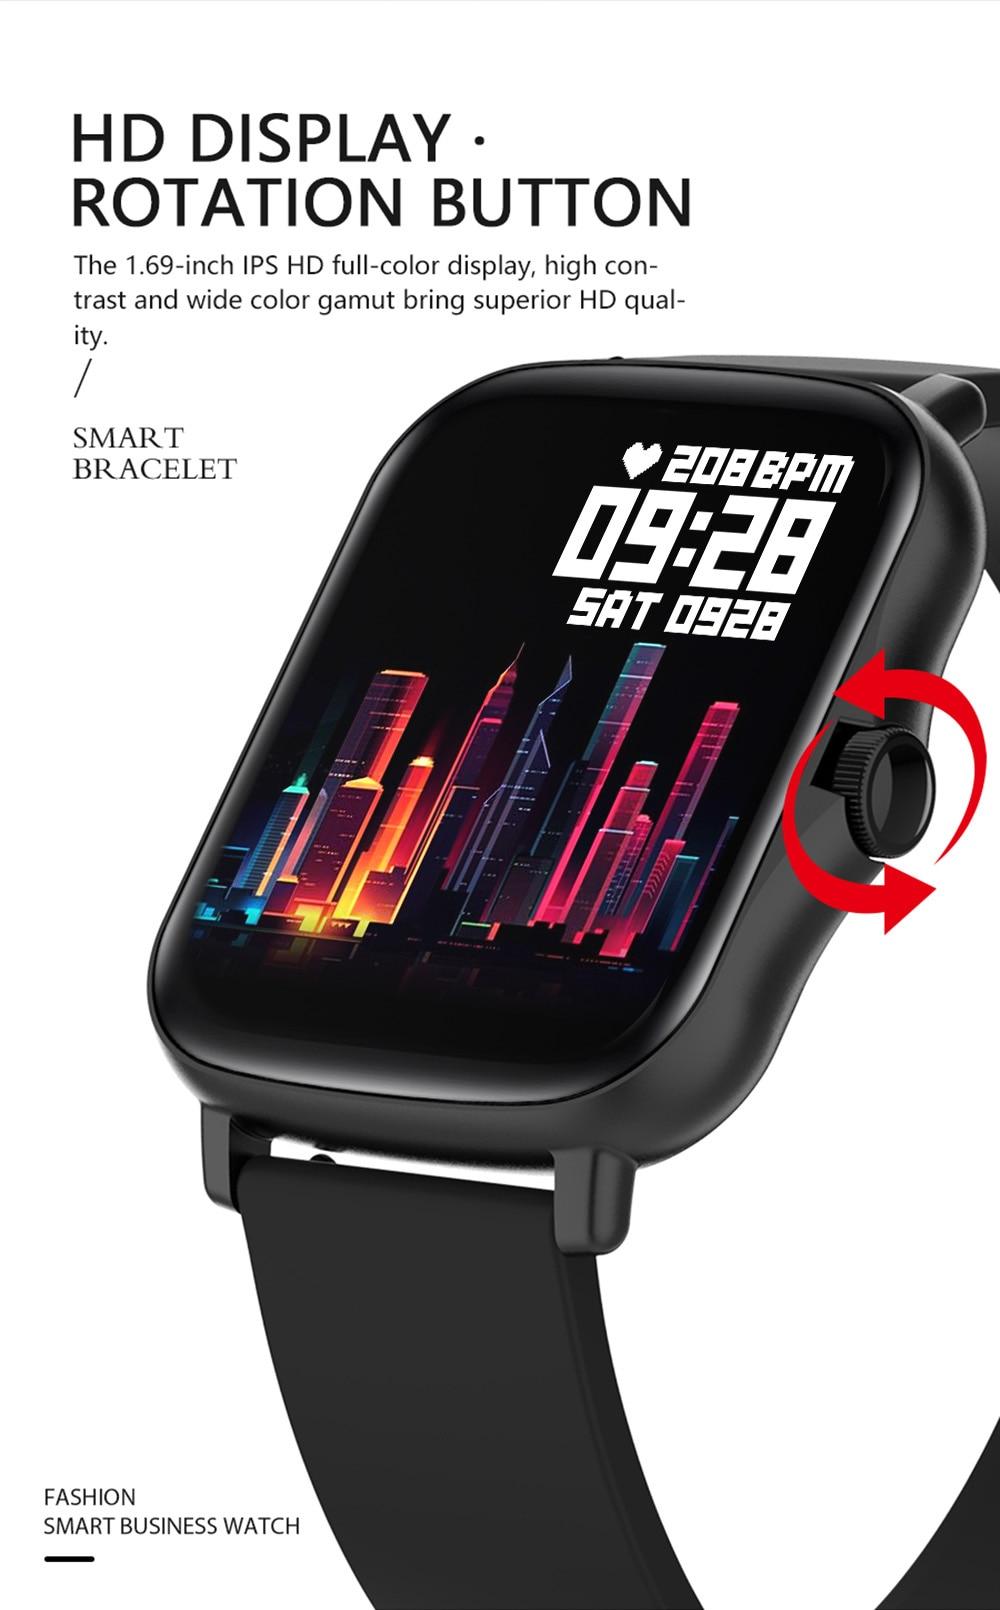 H437c9de4dc98457da331d2d78e3f1e508 COLMI P8 Plus 1.69 inch 2021 Smart Watch Men Full Touch Fitness Tracker IP67 waterproof Women GTS 2 Smartwatch for Xiaomi phone